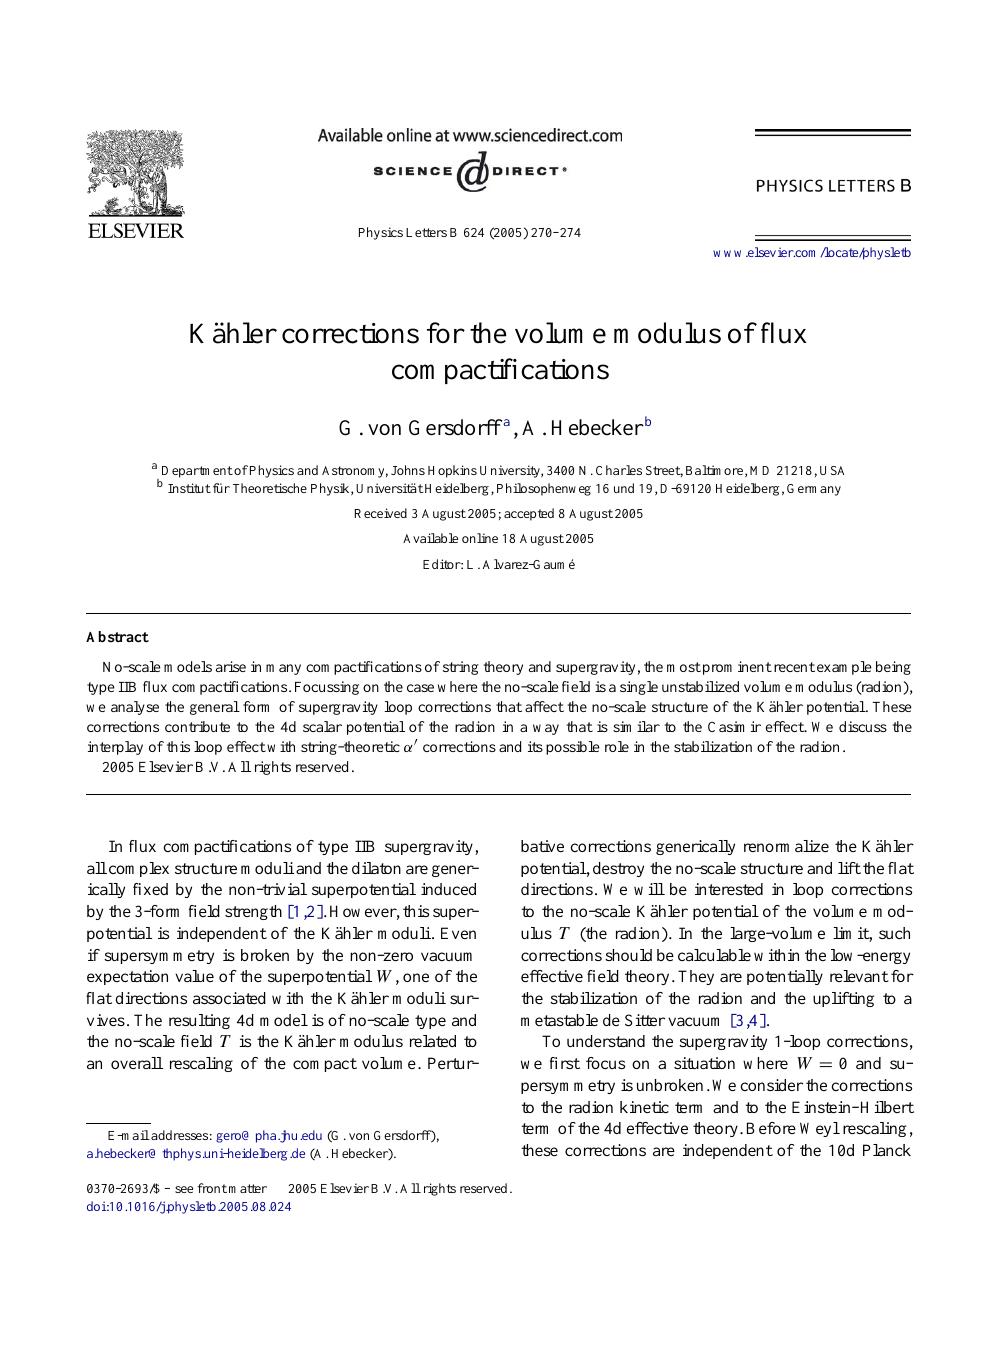 Kähler corrections for the volume modulus of flux